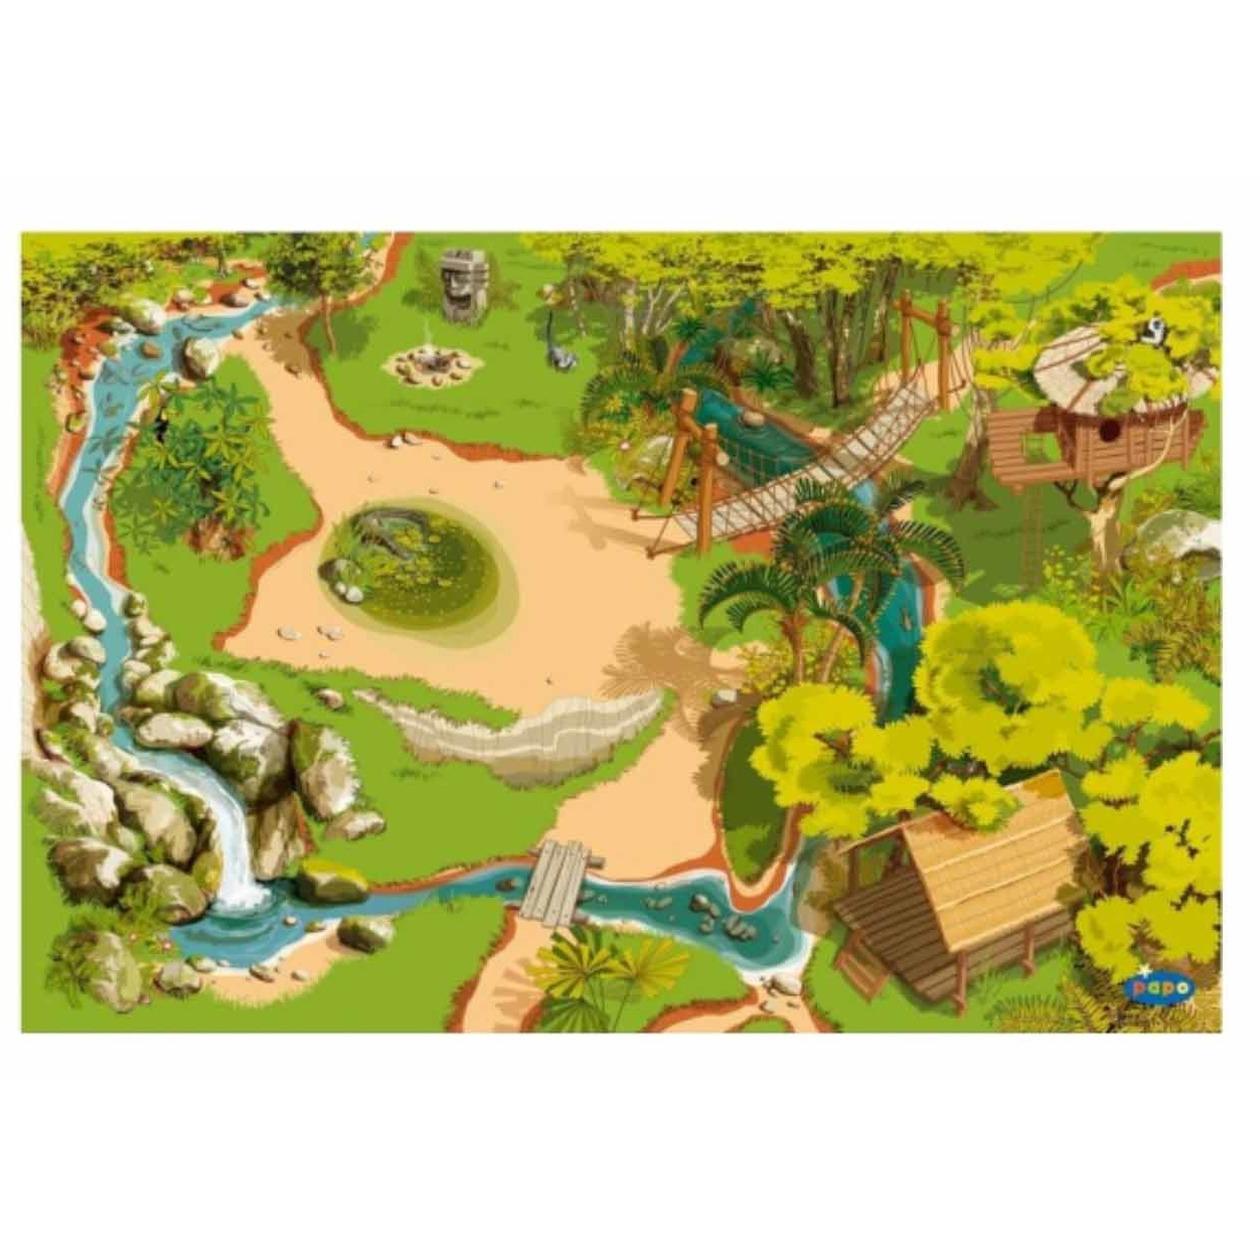 Jungle speelkleden 95 x 135 cm